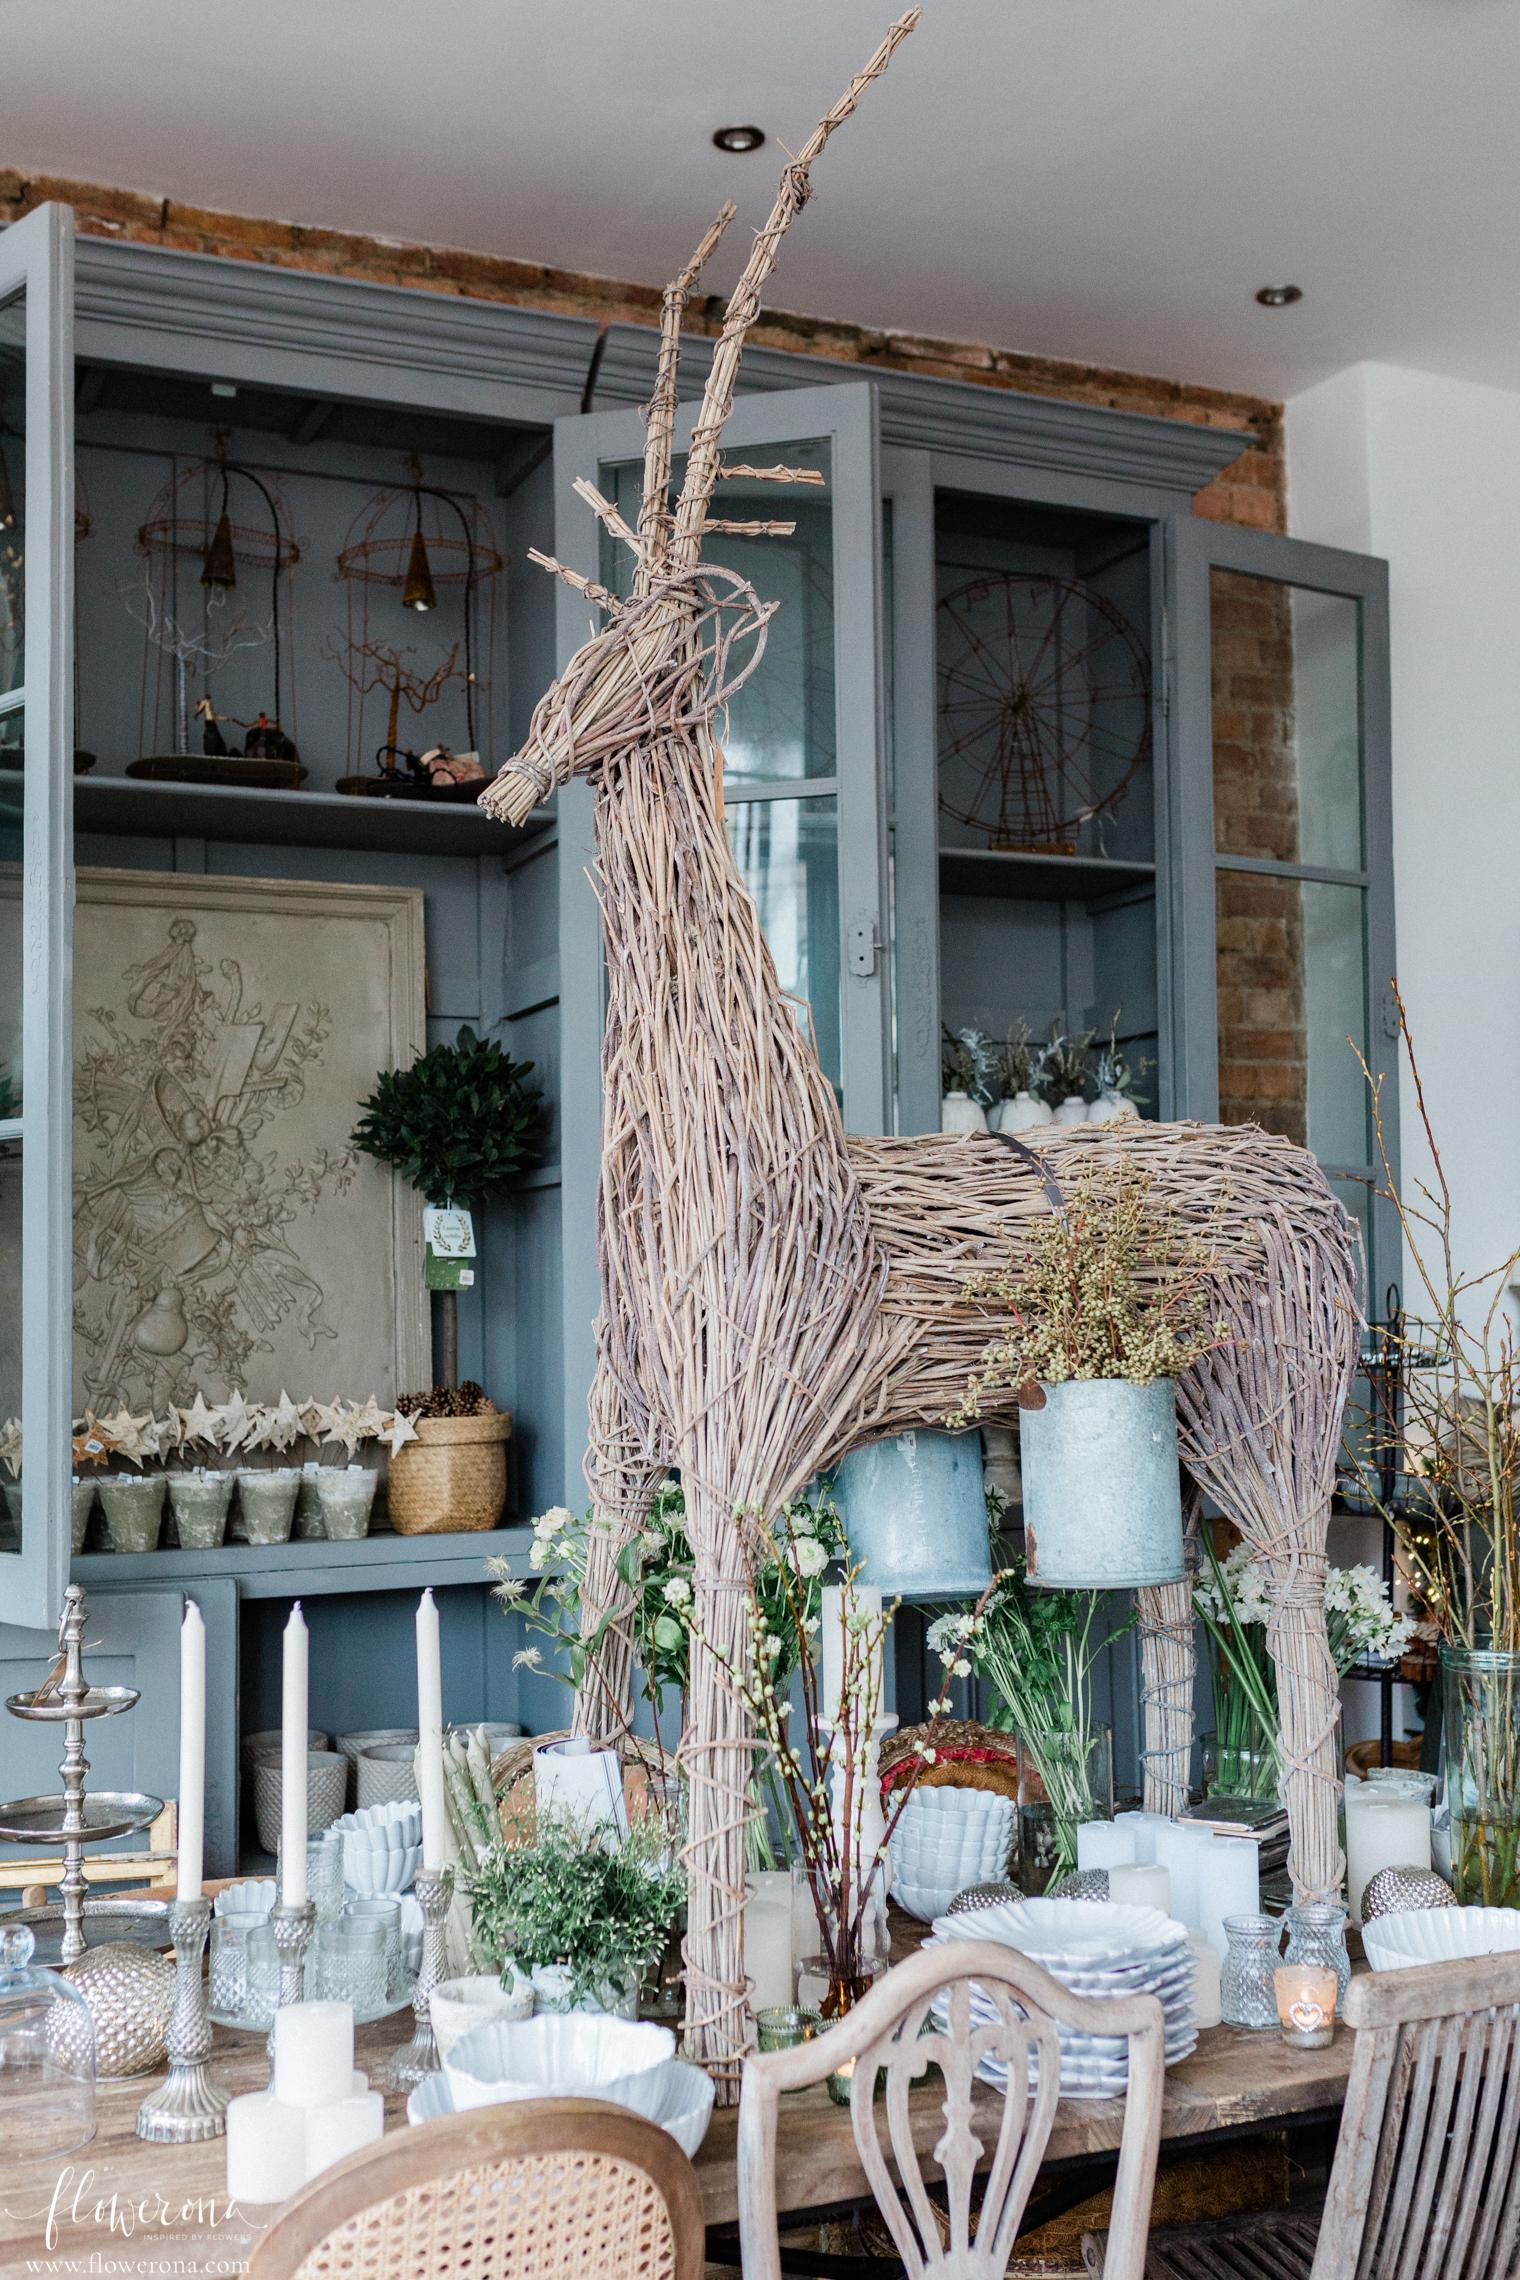 Florist Shop at Christmas